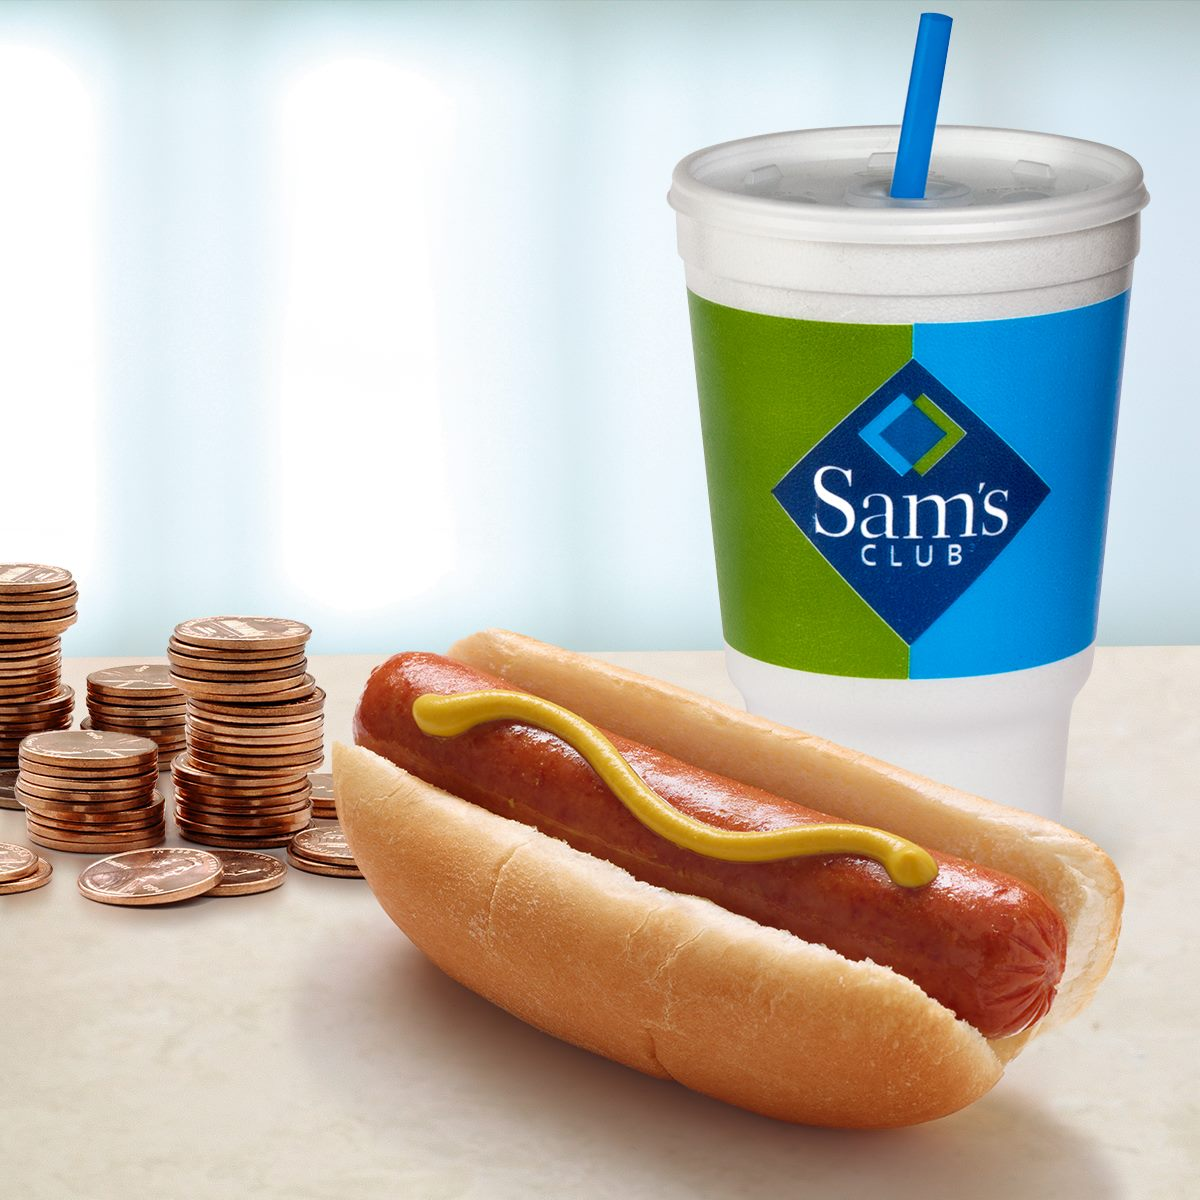 Sam S Club Hot Dog Calories